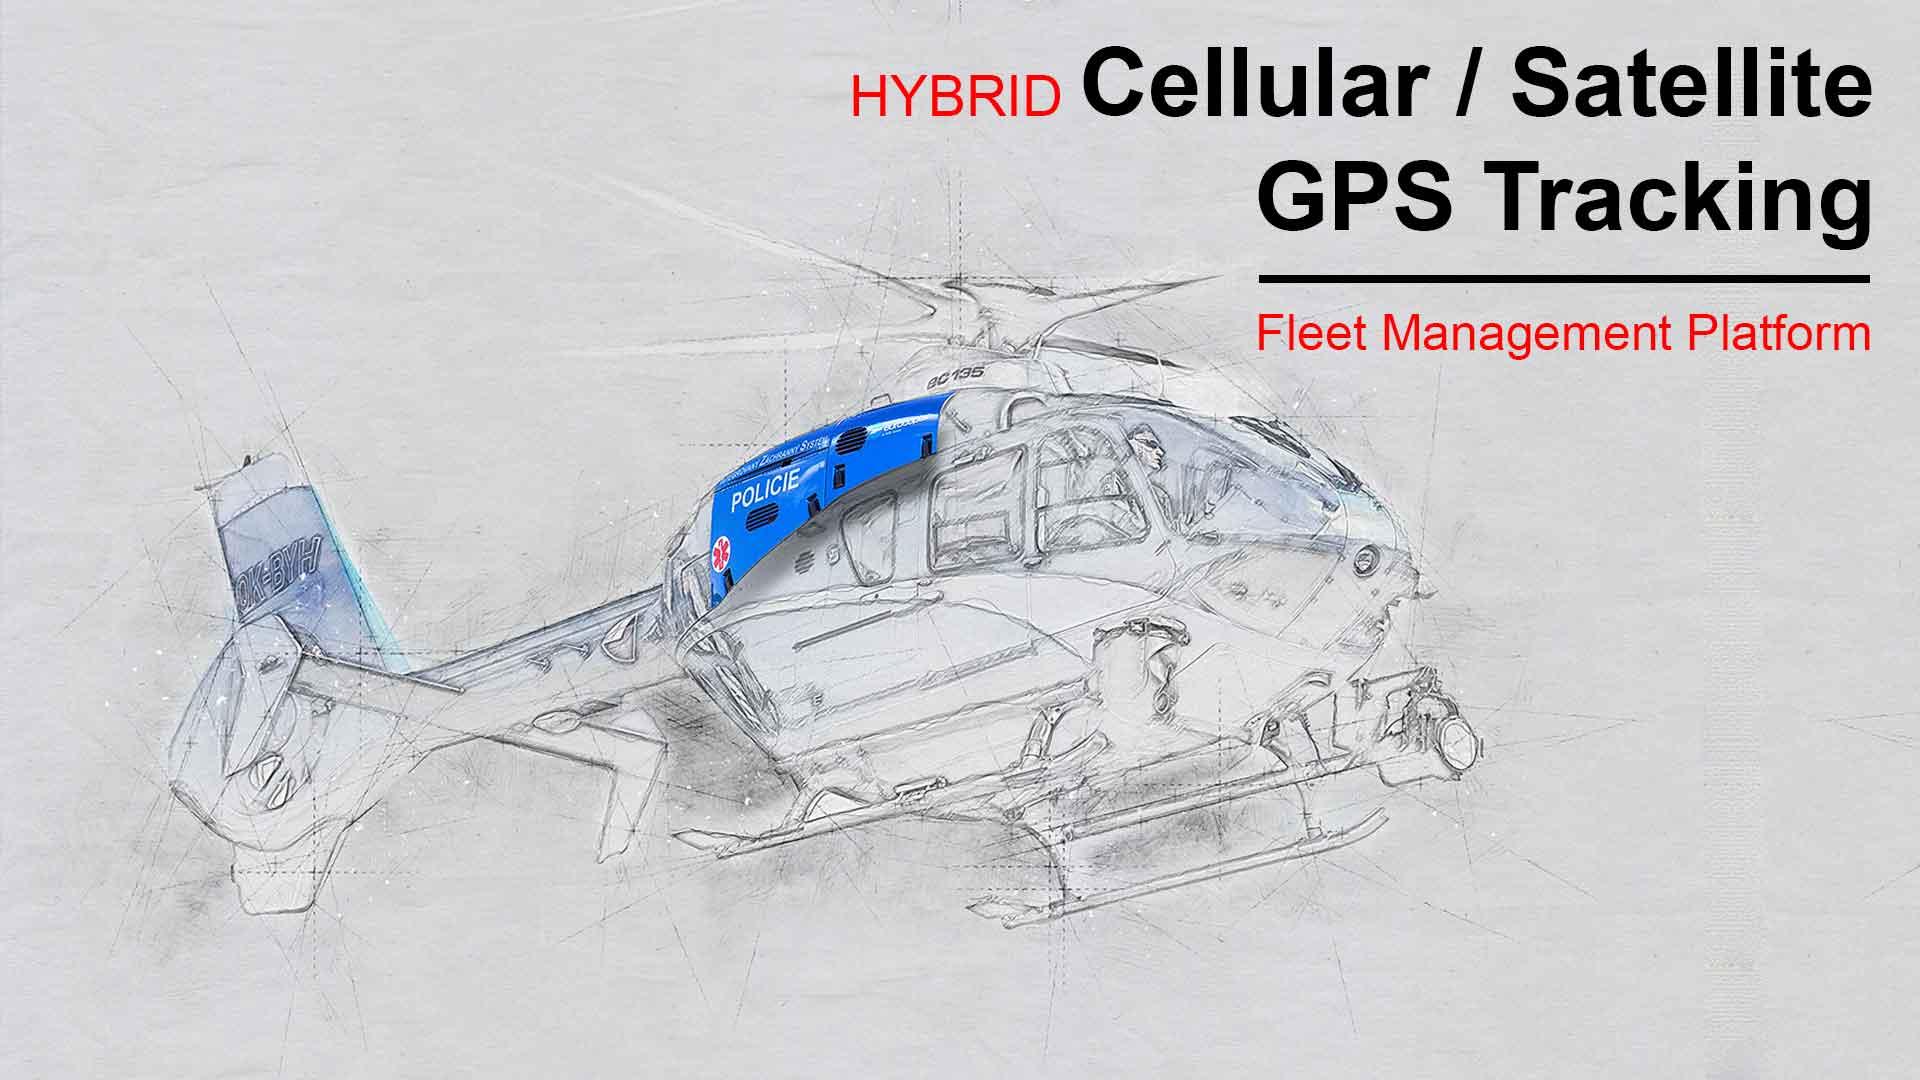 Fleet Management Platform